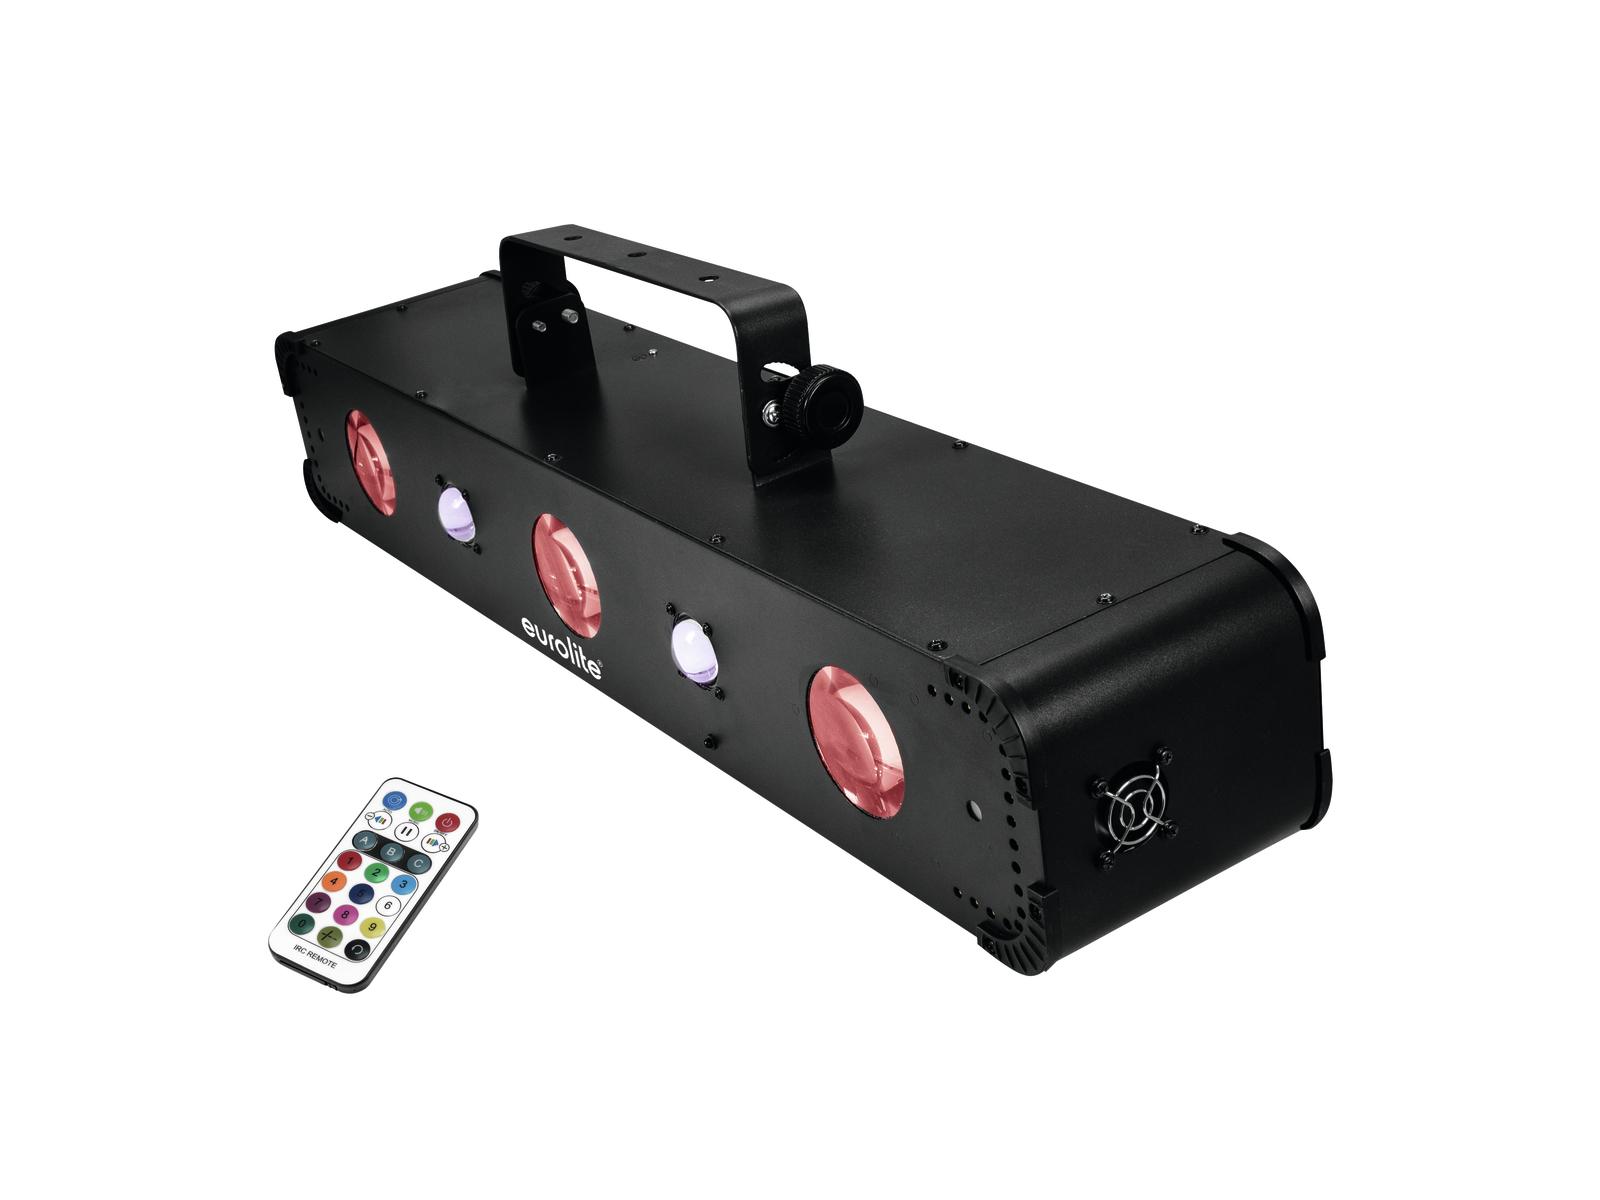 Eurolite LED Multi FX Hybrid, 2x RG laser, 3x paprskový efeklt, UV, DMX